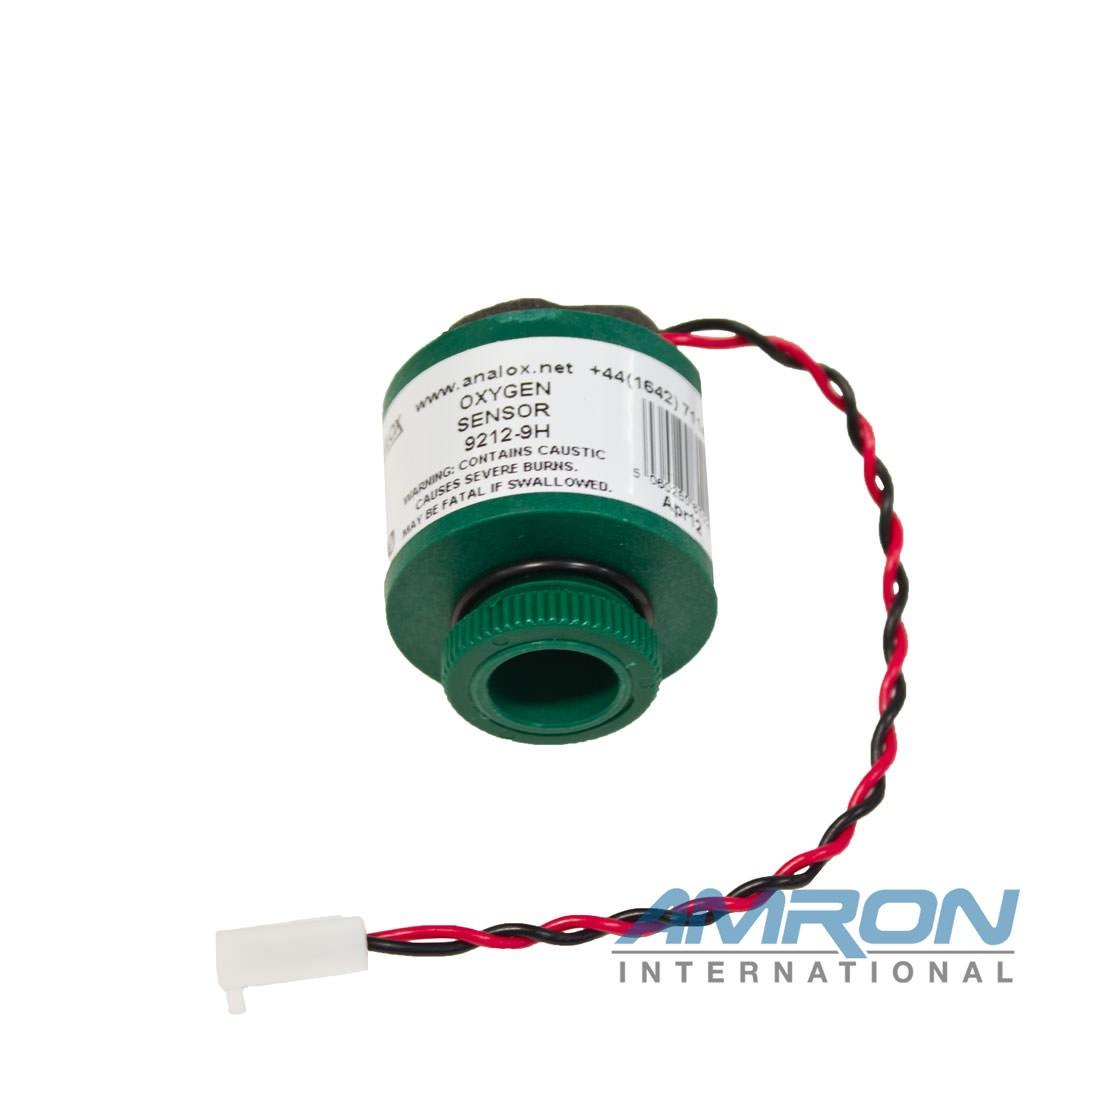 Analox Spare O2 Cell (O-2000 mBar)